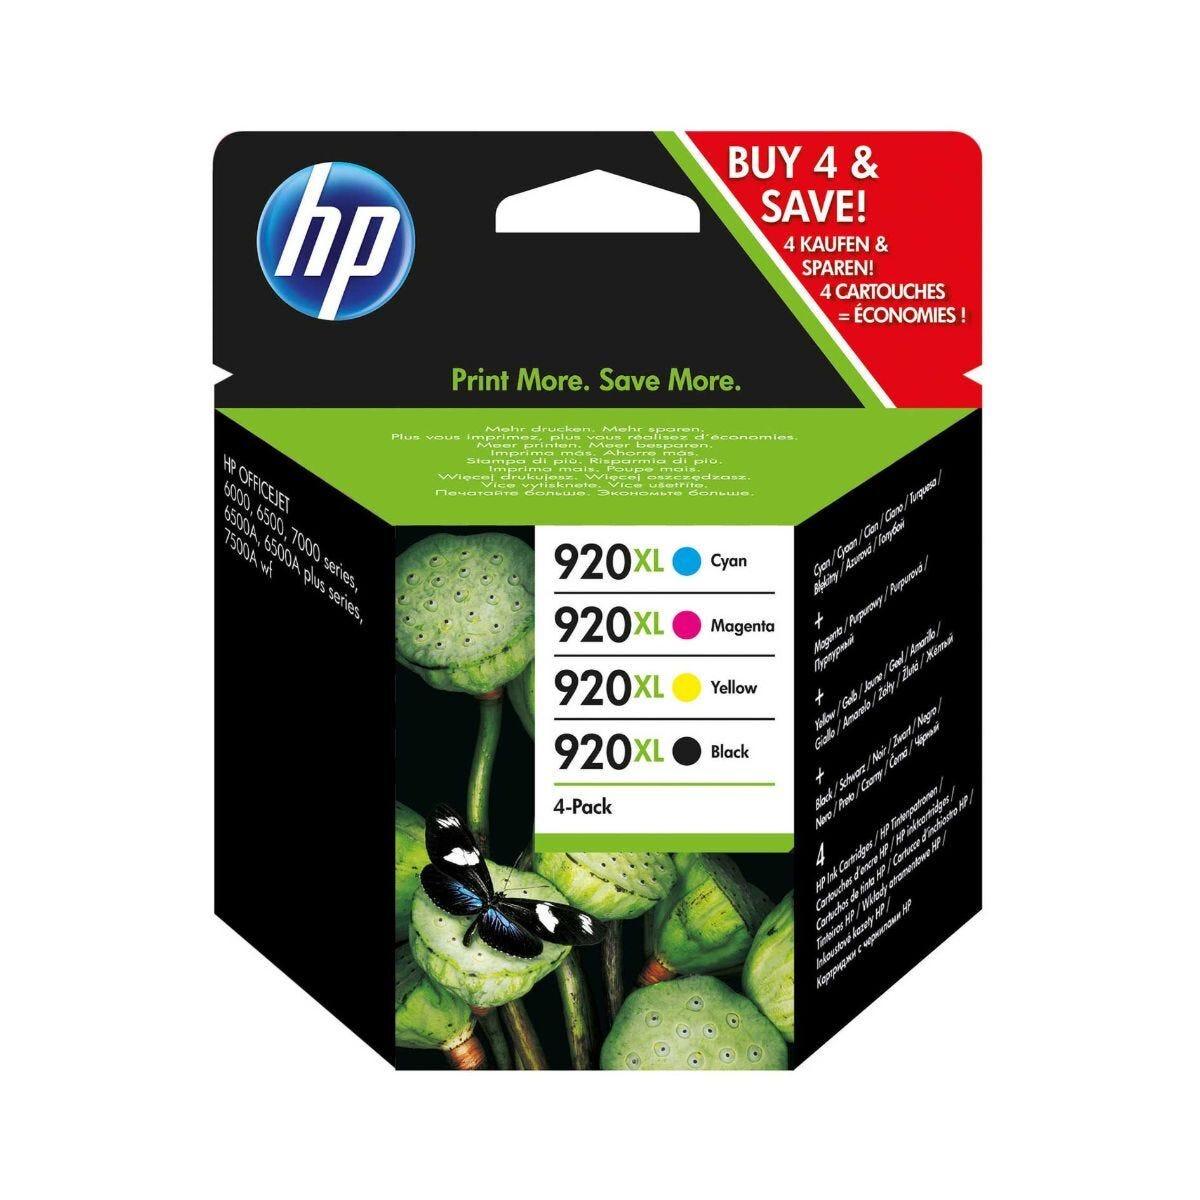 HP 920XL Inkjet Cartridge Multi Pack